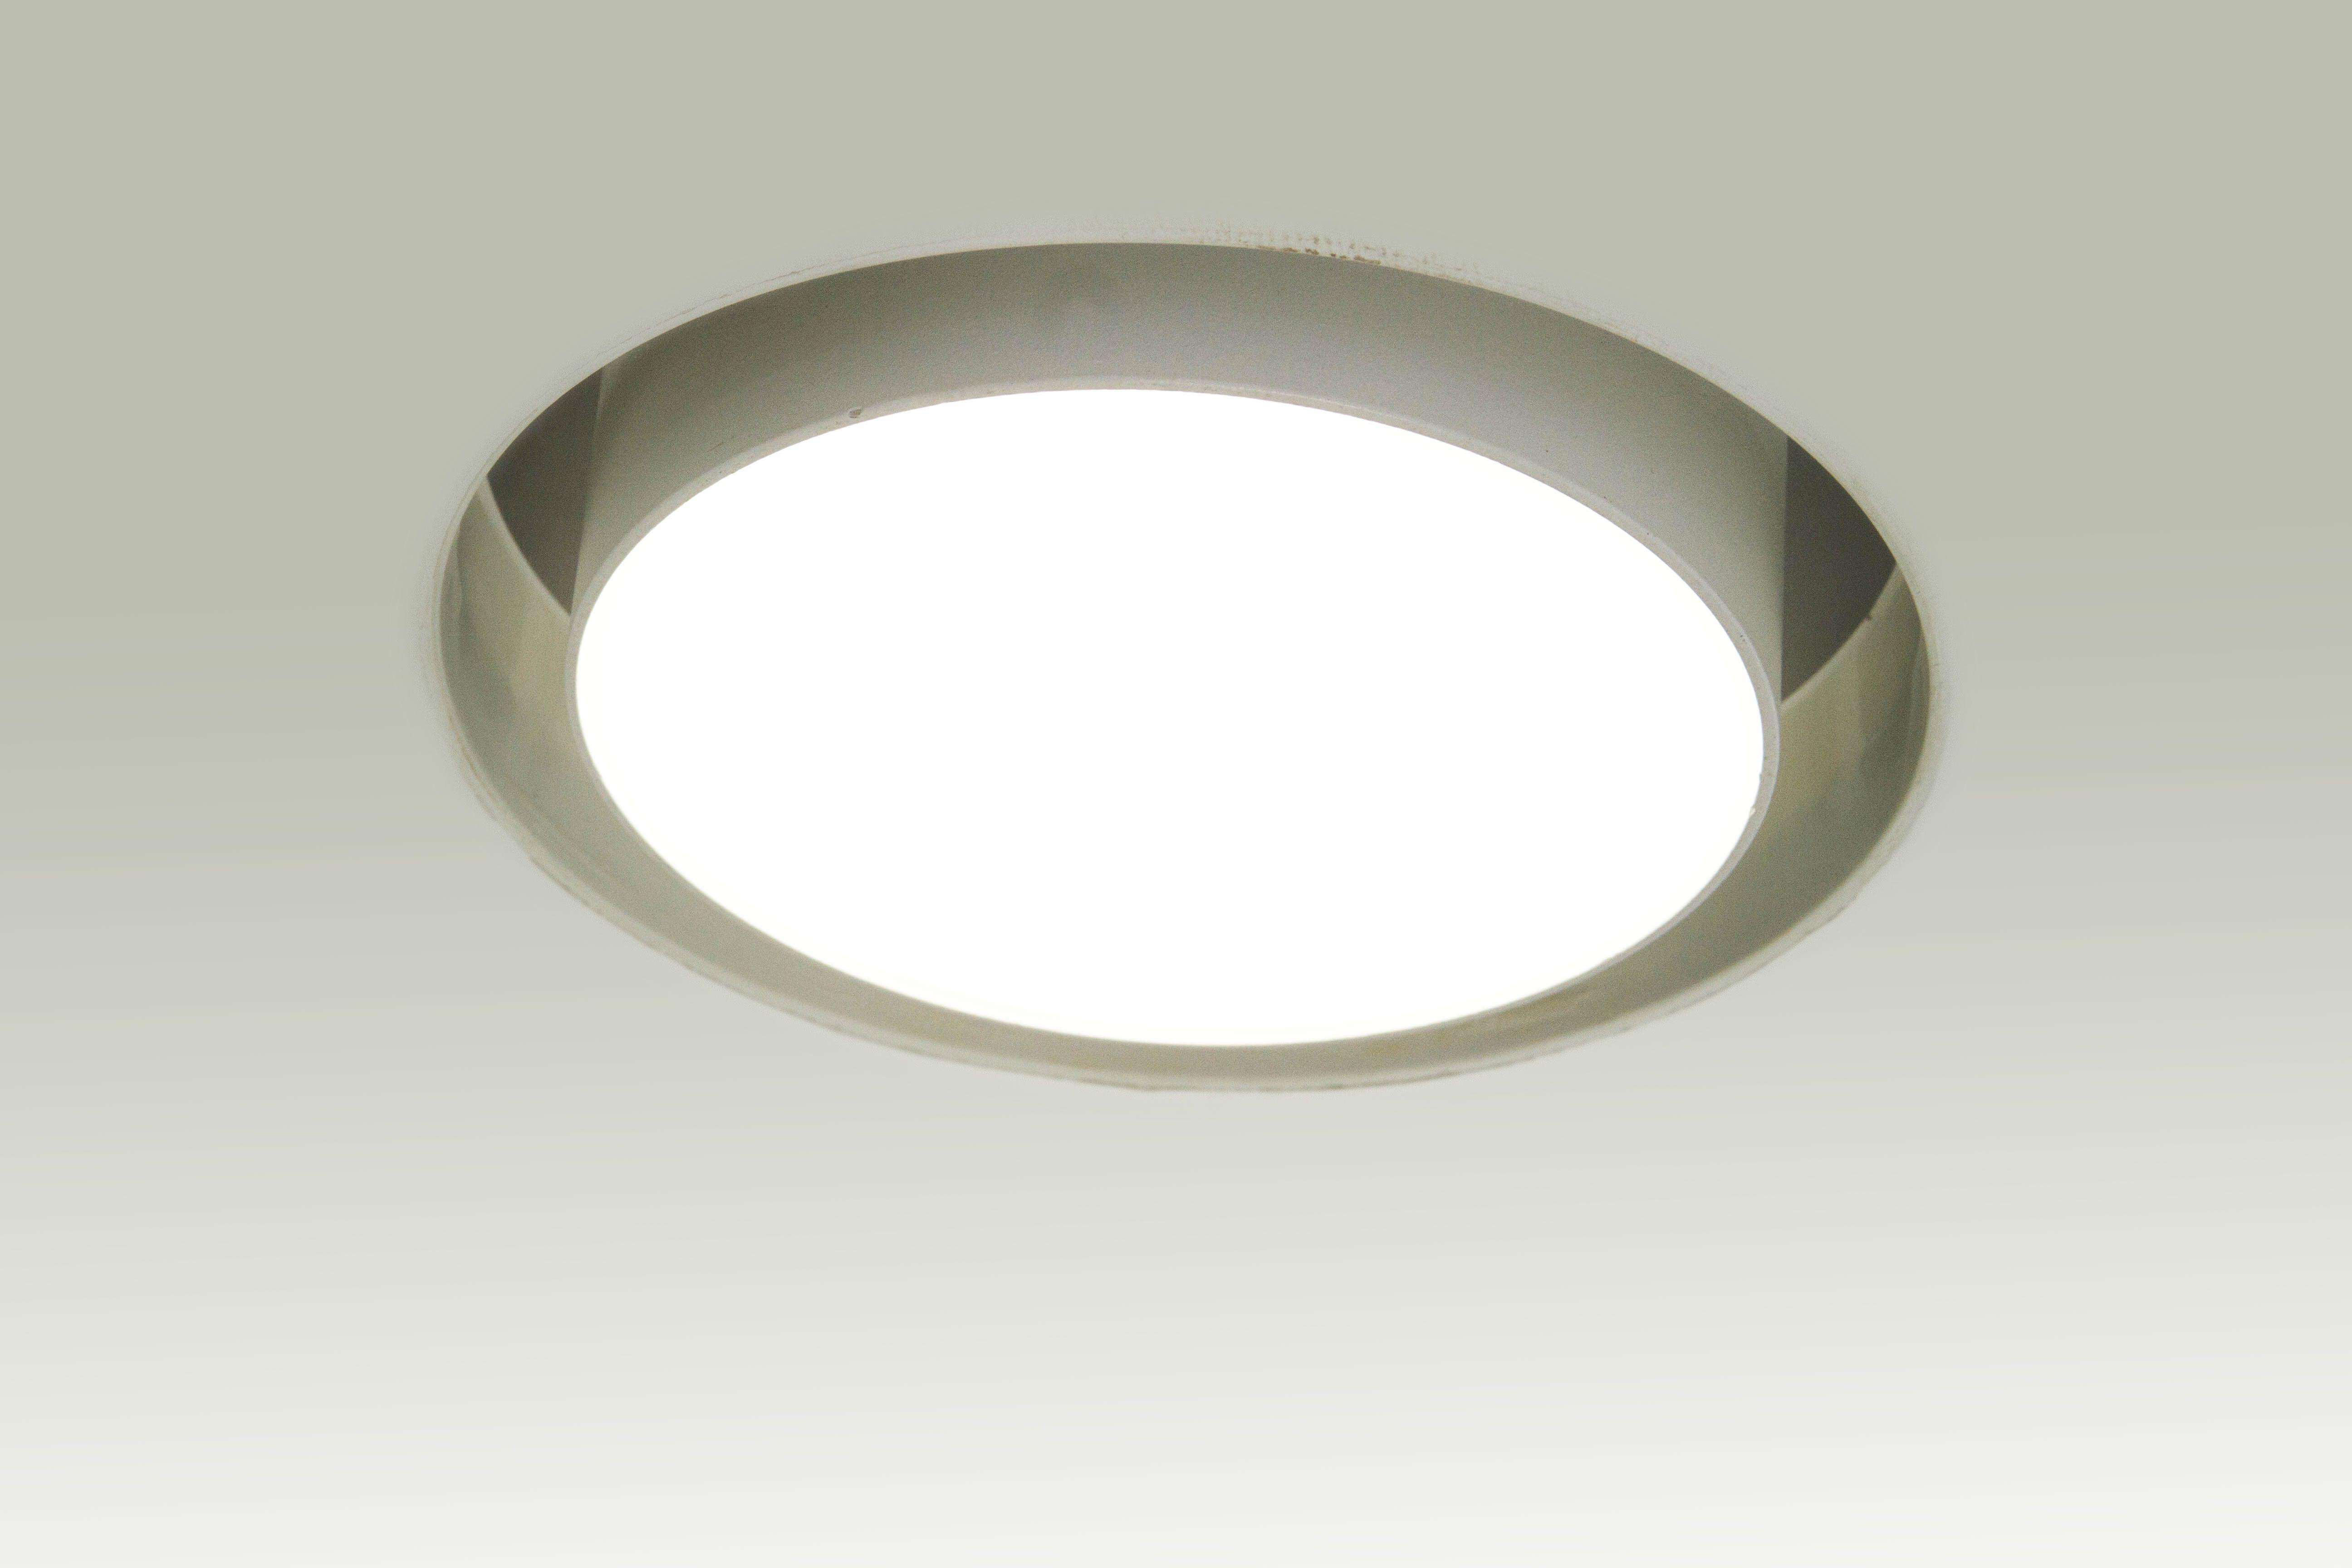 Luminaria Ojo De Buey Avante Iluminacion Iluminacioninterior Light Lighting Lightdesign Led Interior Int Iluminacion Interior Ojo De Buey Iluminacion